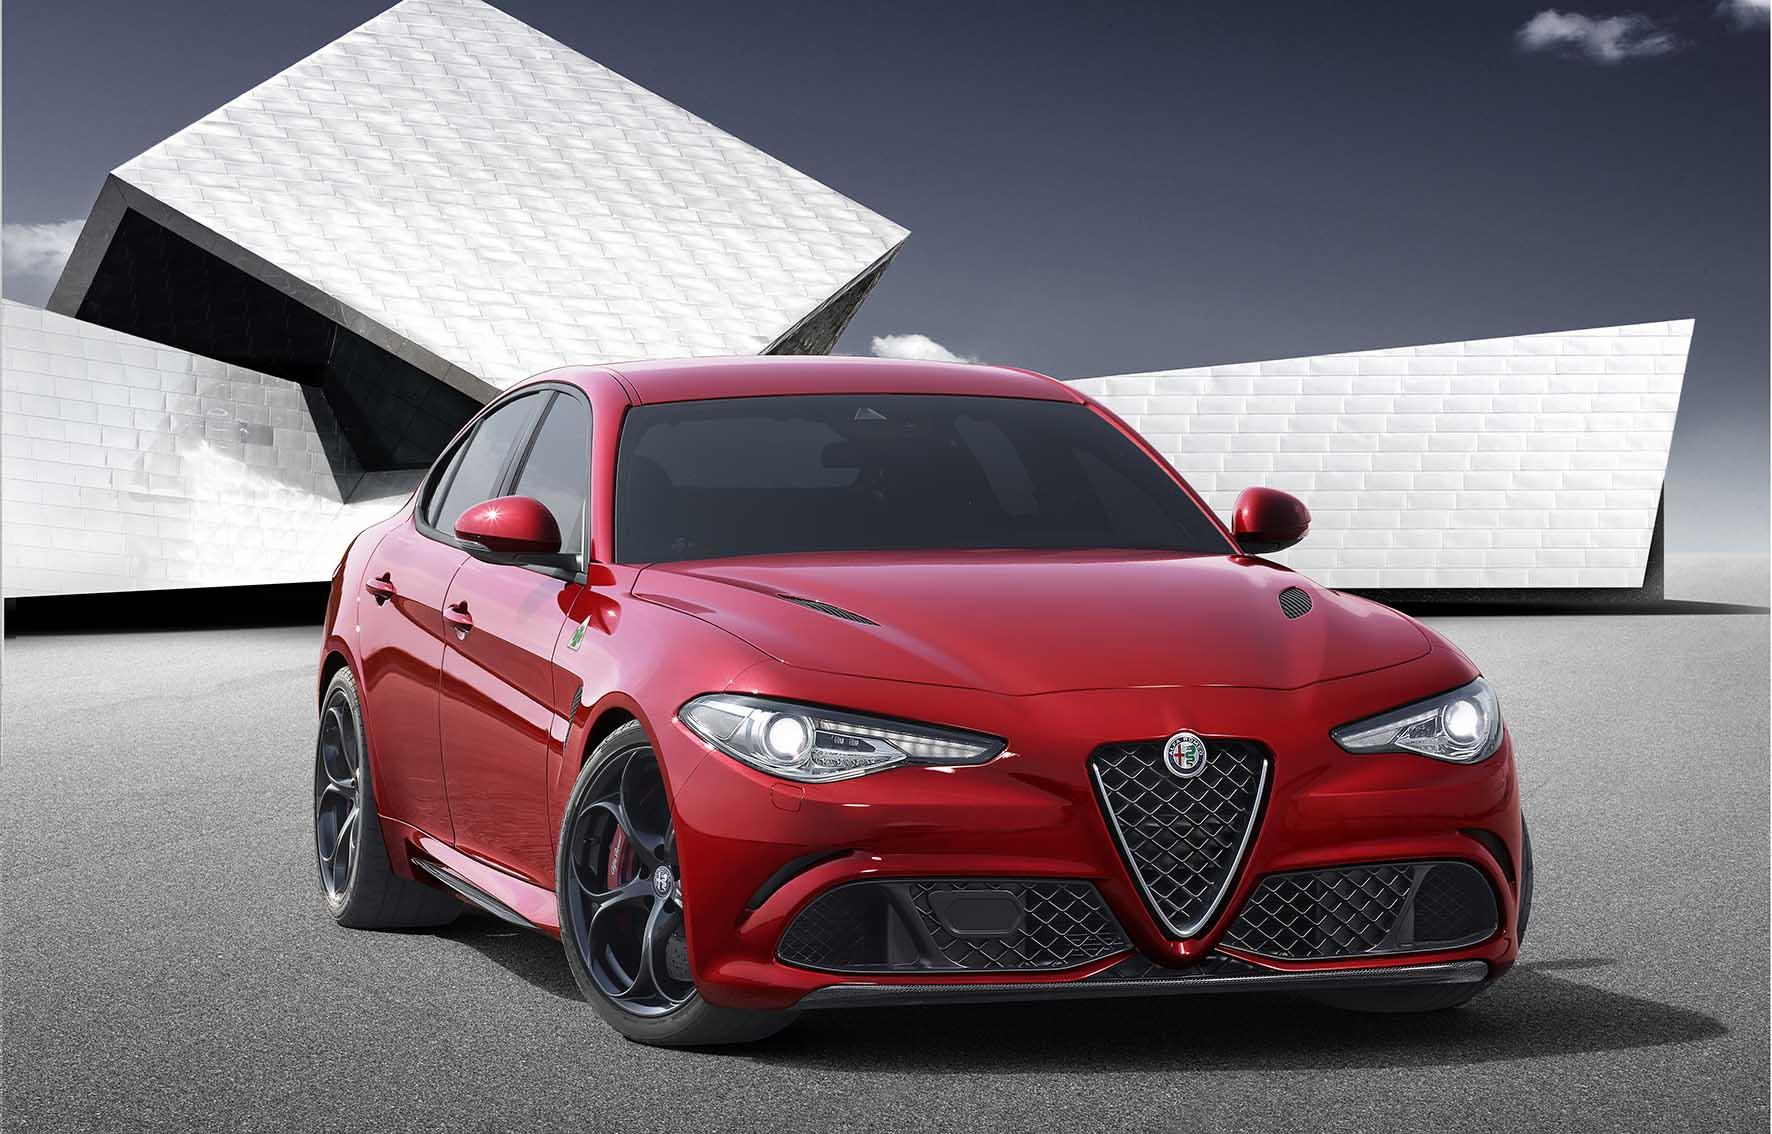 Alfa Romeo Giulia Quadrifoglio Verde frontlat